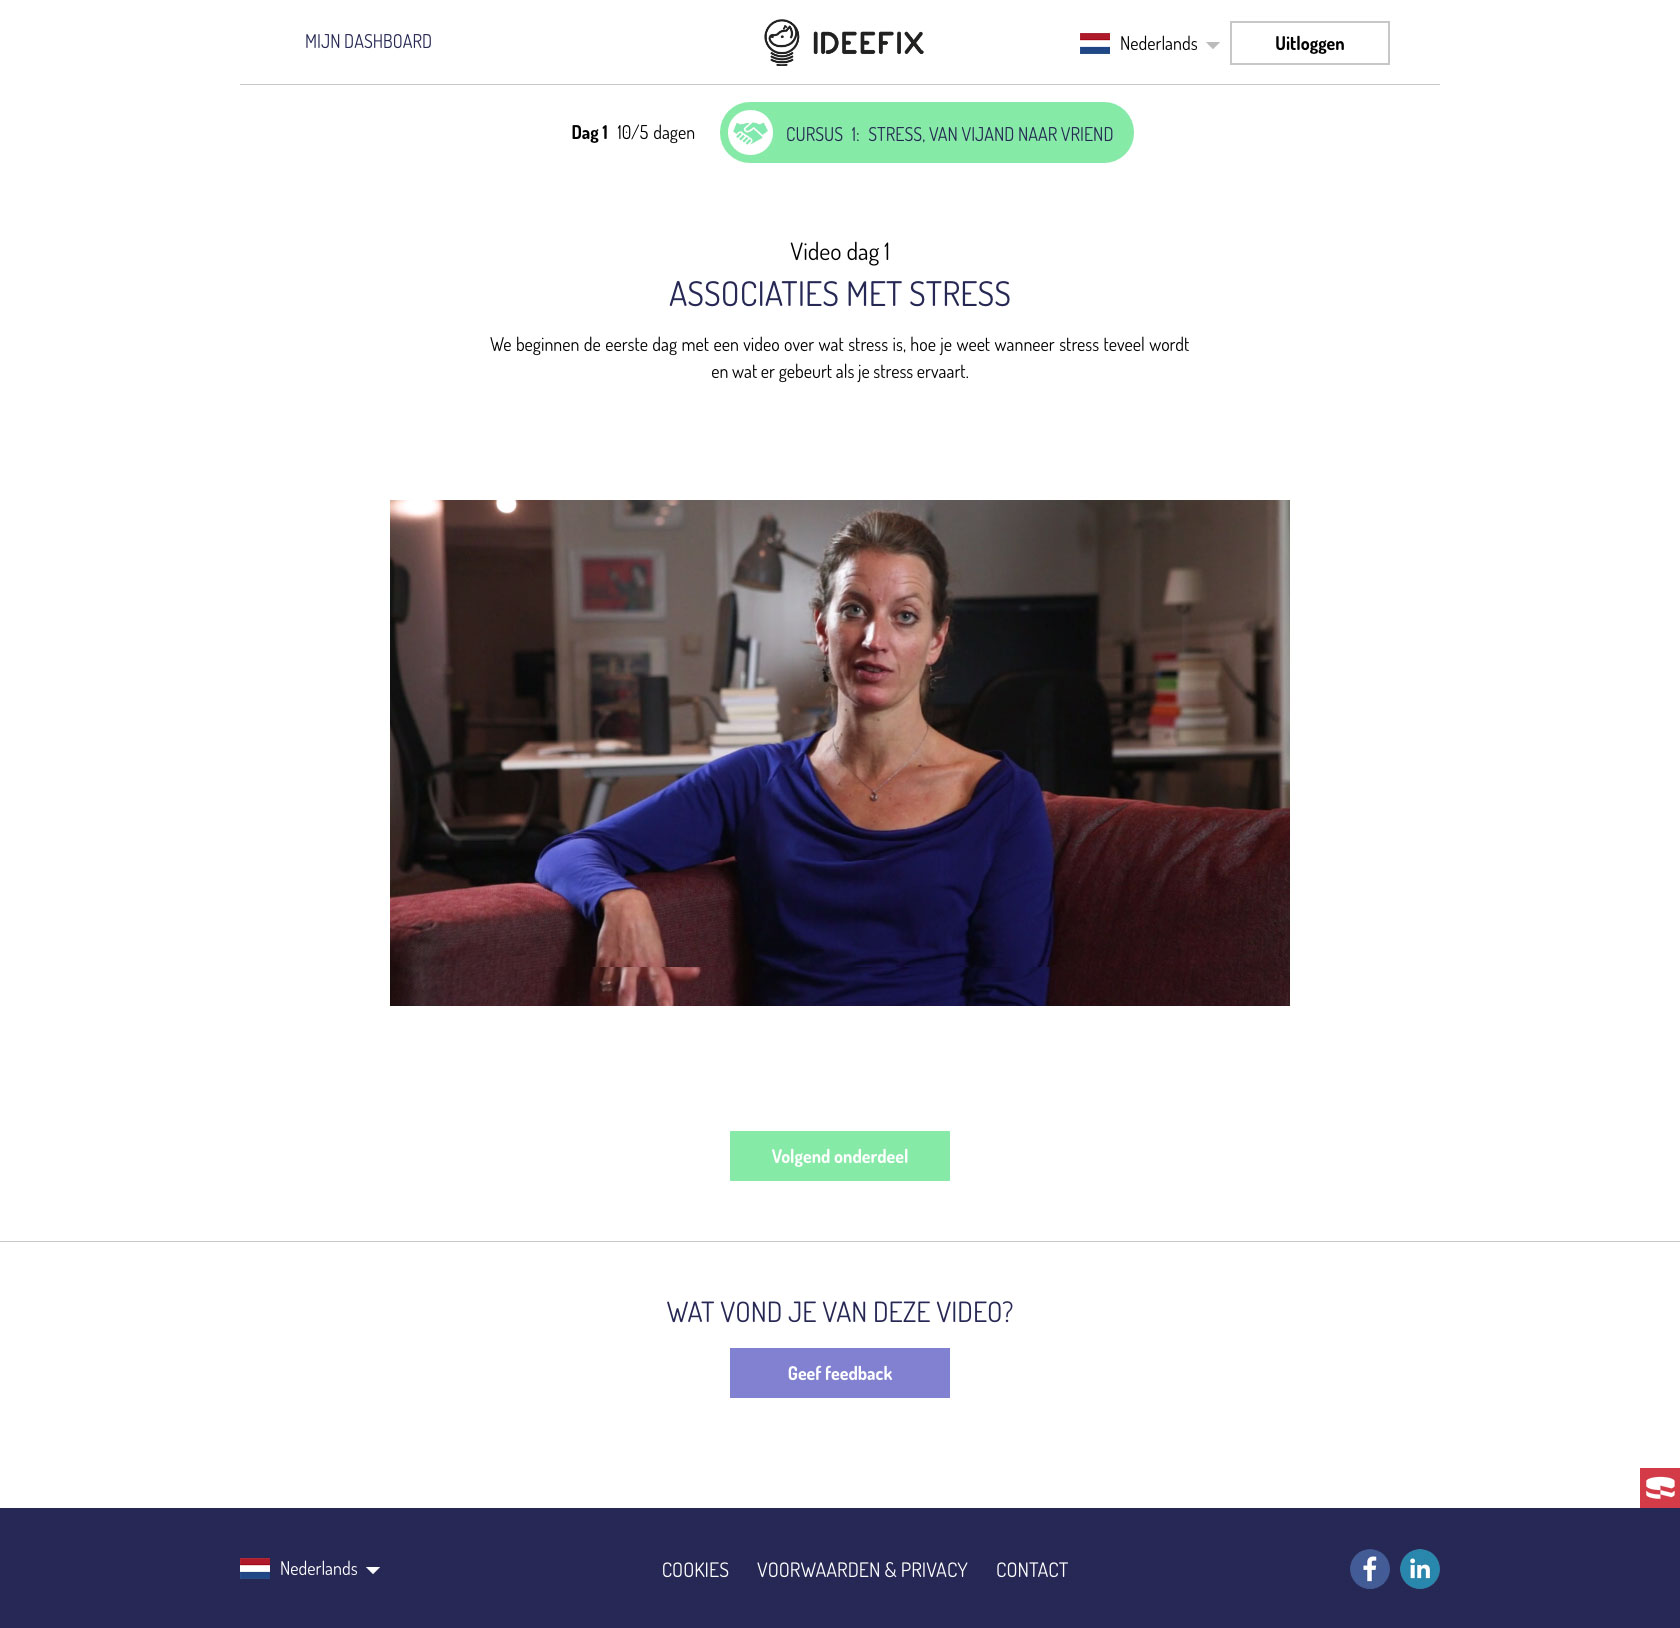 https://ideefix-cdn.s3.eu-central-1.amazonaws.com/module_screenshot/JqkrdPMpESpkES2ncWZe_picture.jpg